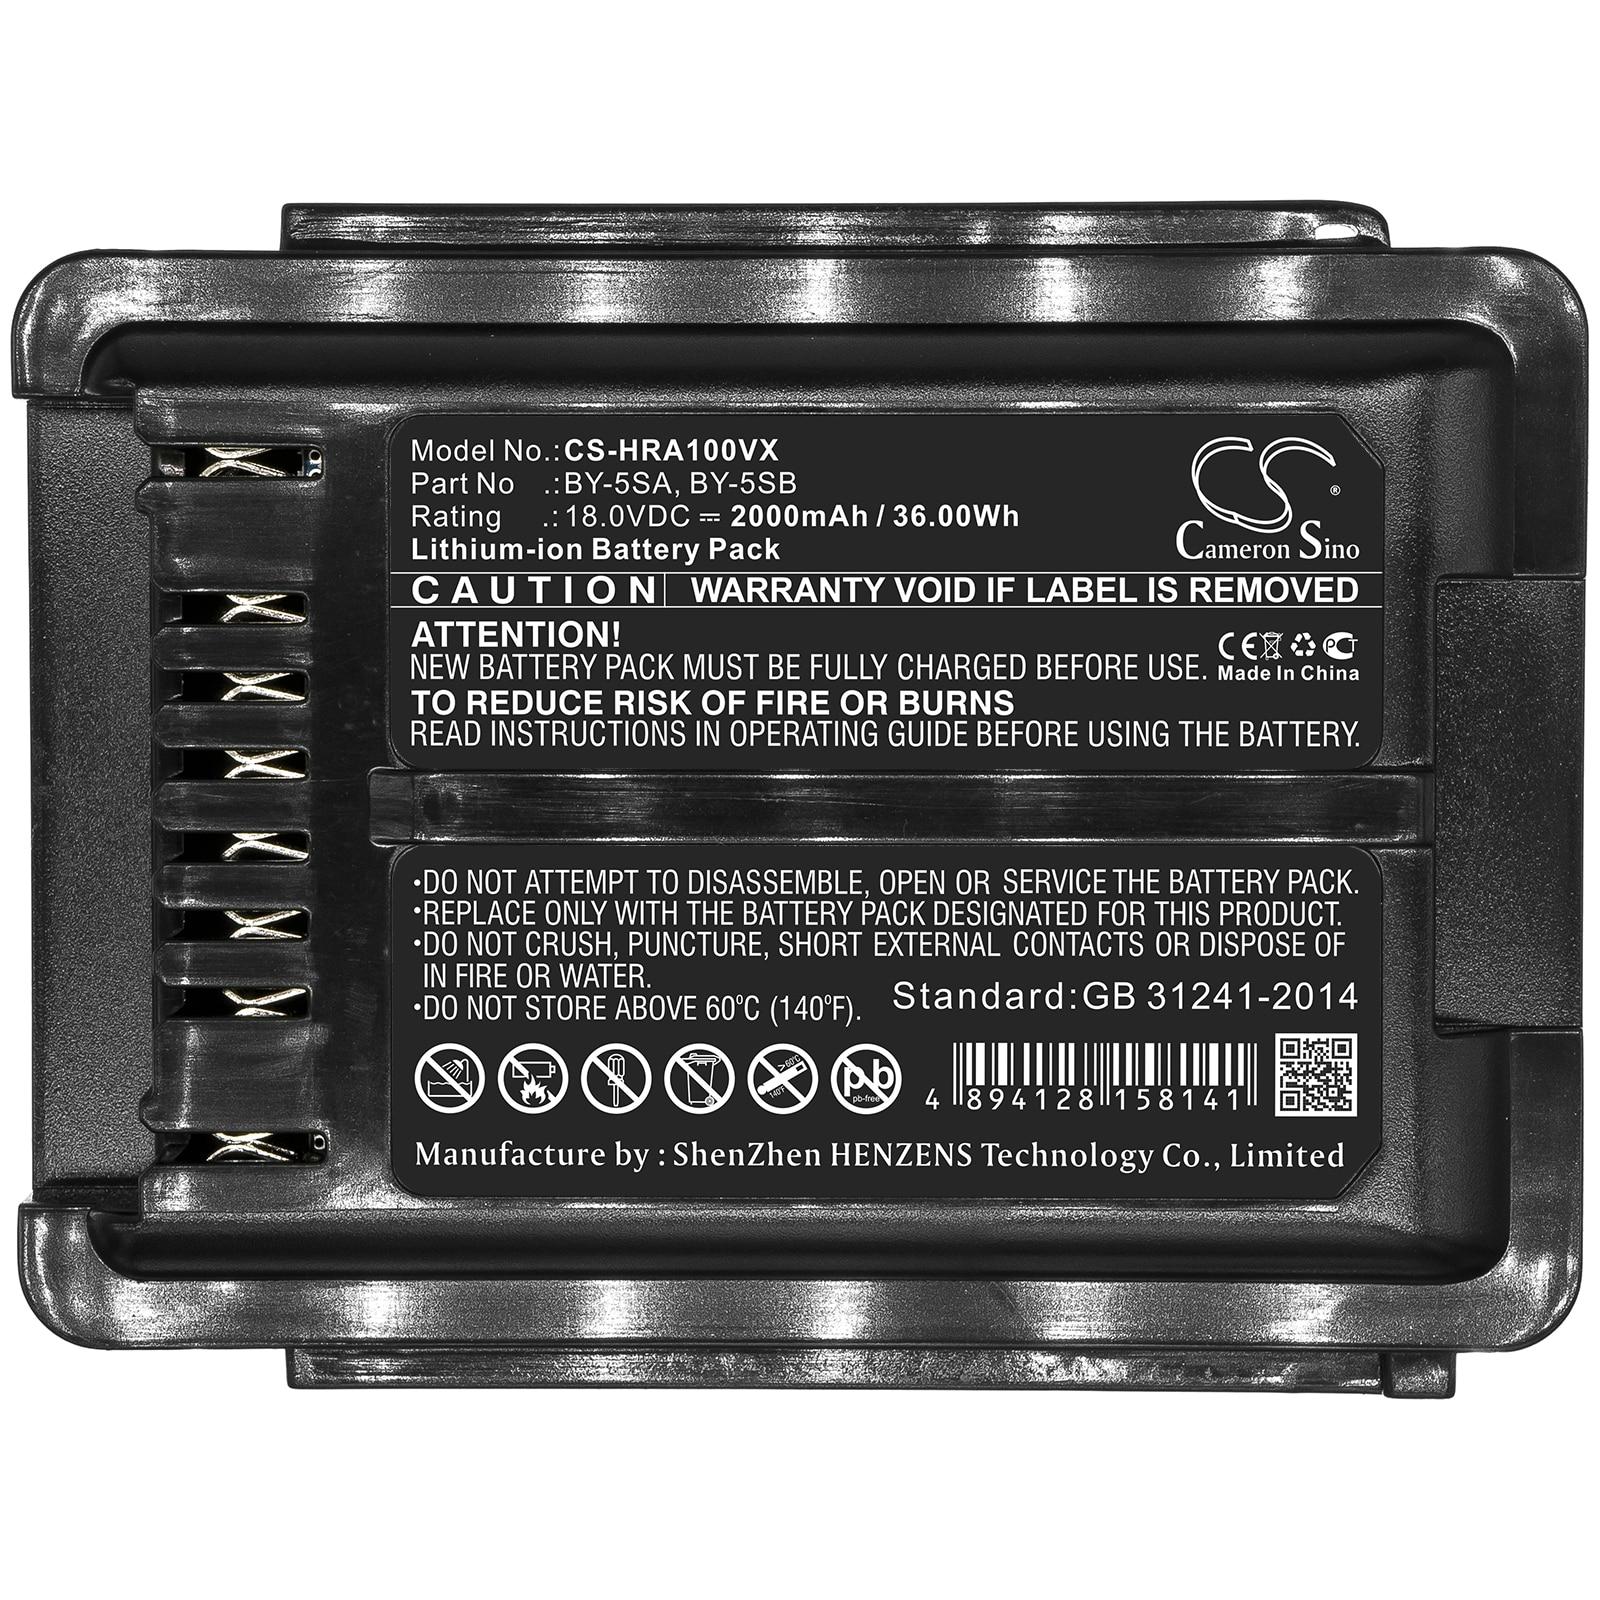 Generic بطارية 2000mA لشارب EC-AS500-Y ، EC-AS510 ، EC-AS700 ، EC-AS700-N ، EC-AS710 ، EC-FR5 ، EC-SX20 BY-5SA ، BY-5SB